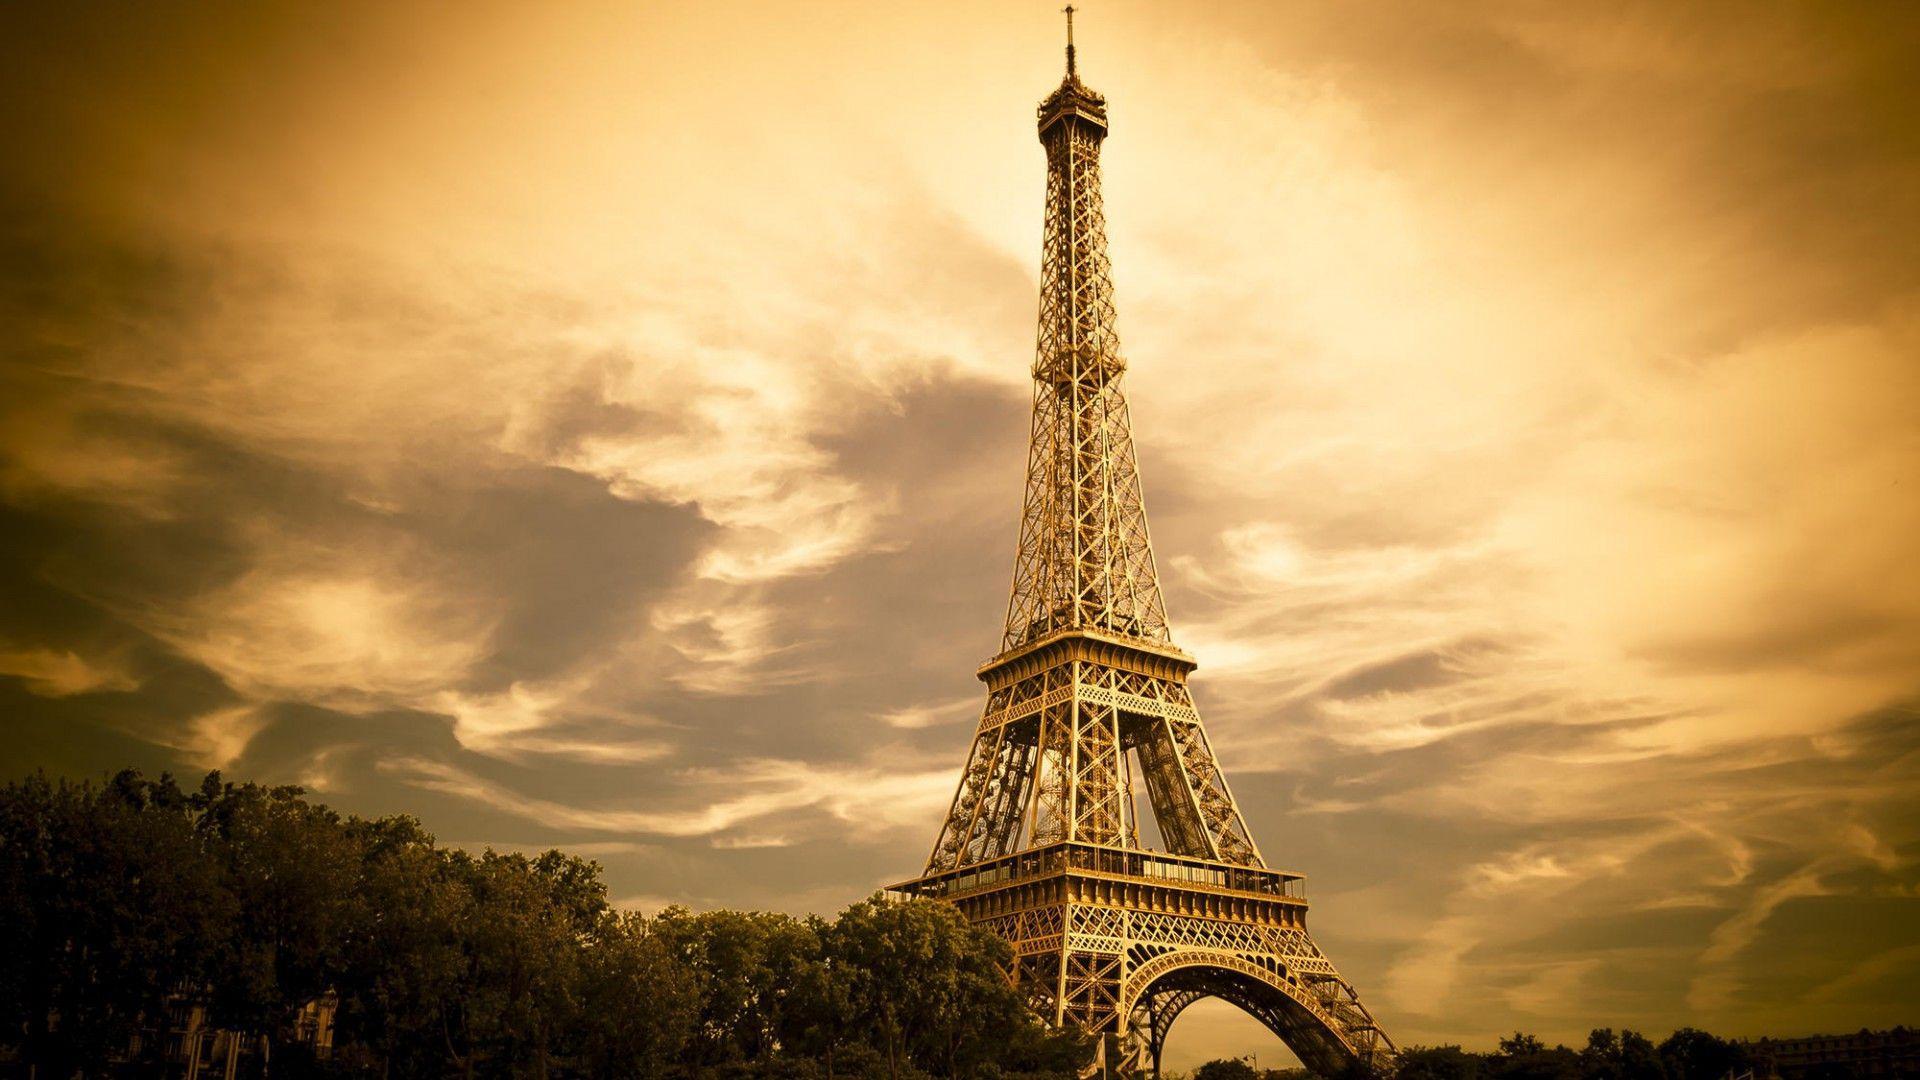 Eiffel Tower Wallpaper [1920x1080] Need iPhone 6S Plus